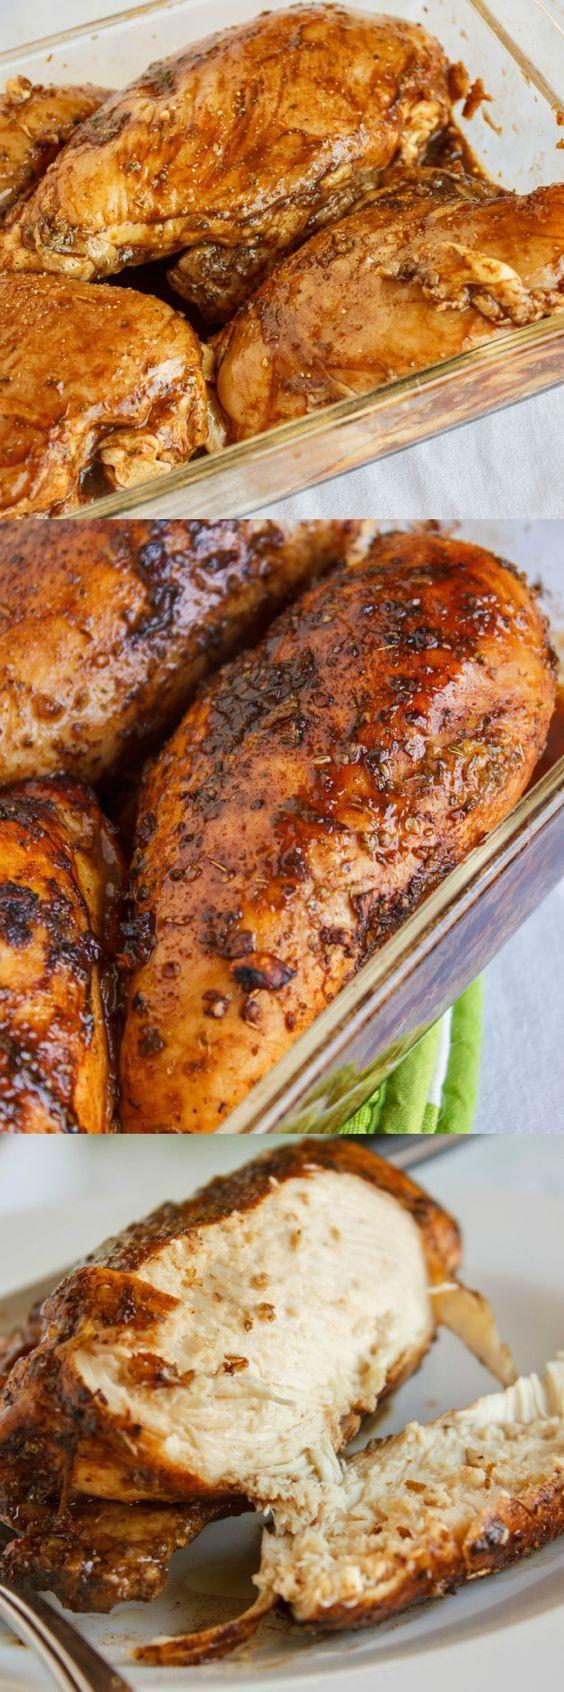 Baked Chicken Breast Recipes Healthy  Baked Balsamic Chicken Recipe